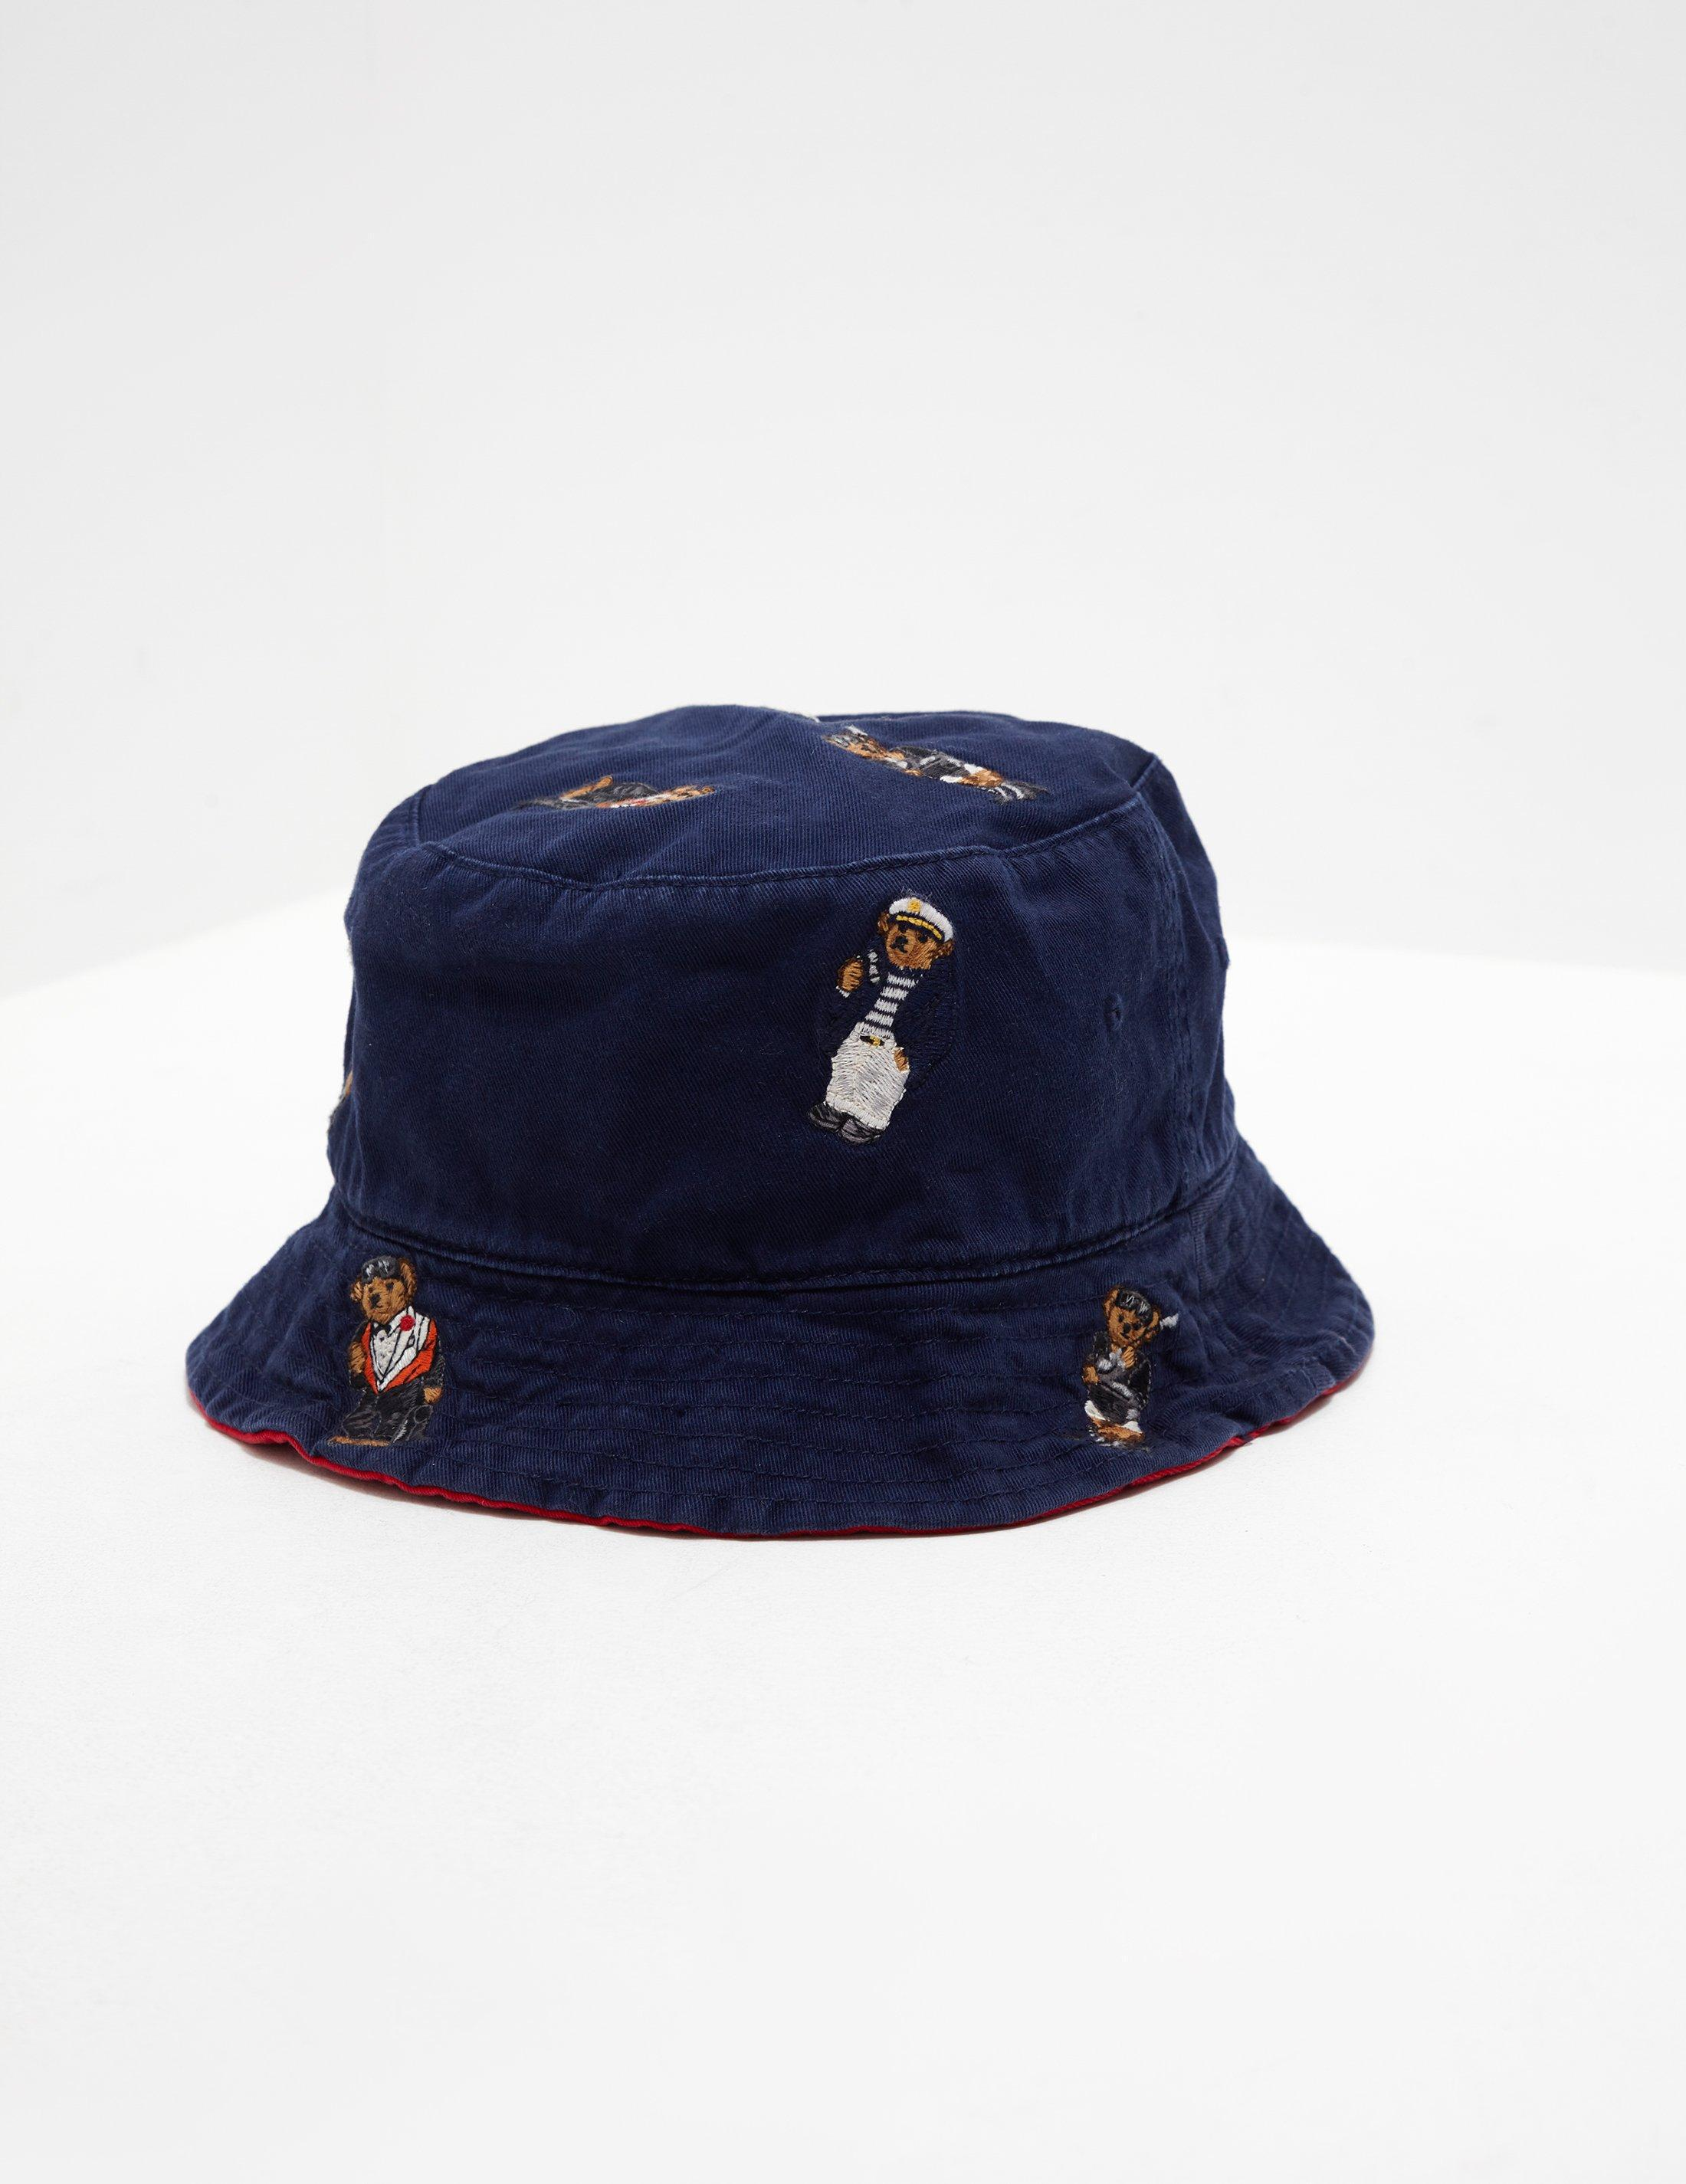 Polo Ralph Lauren Mens Bear Bucket Hat - Online Exclusive Navy Blue ... bdc60f2b0ce